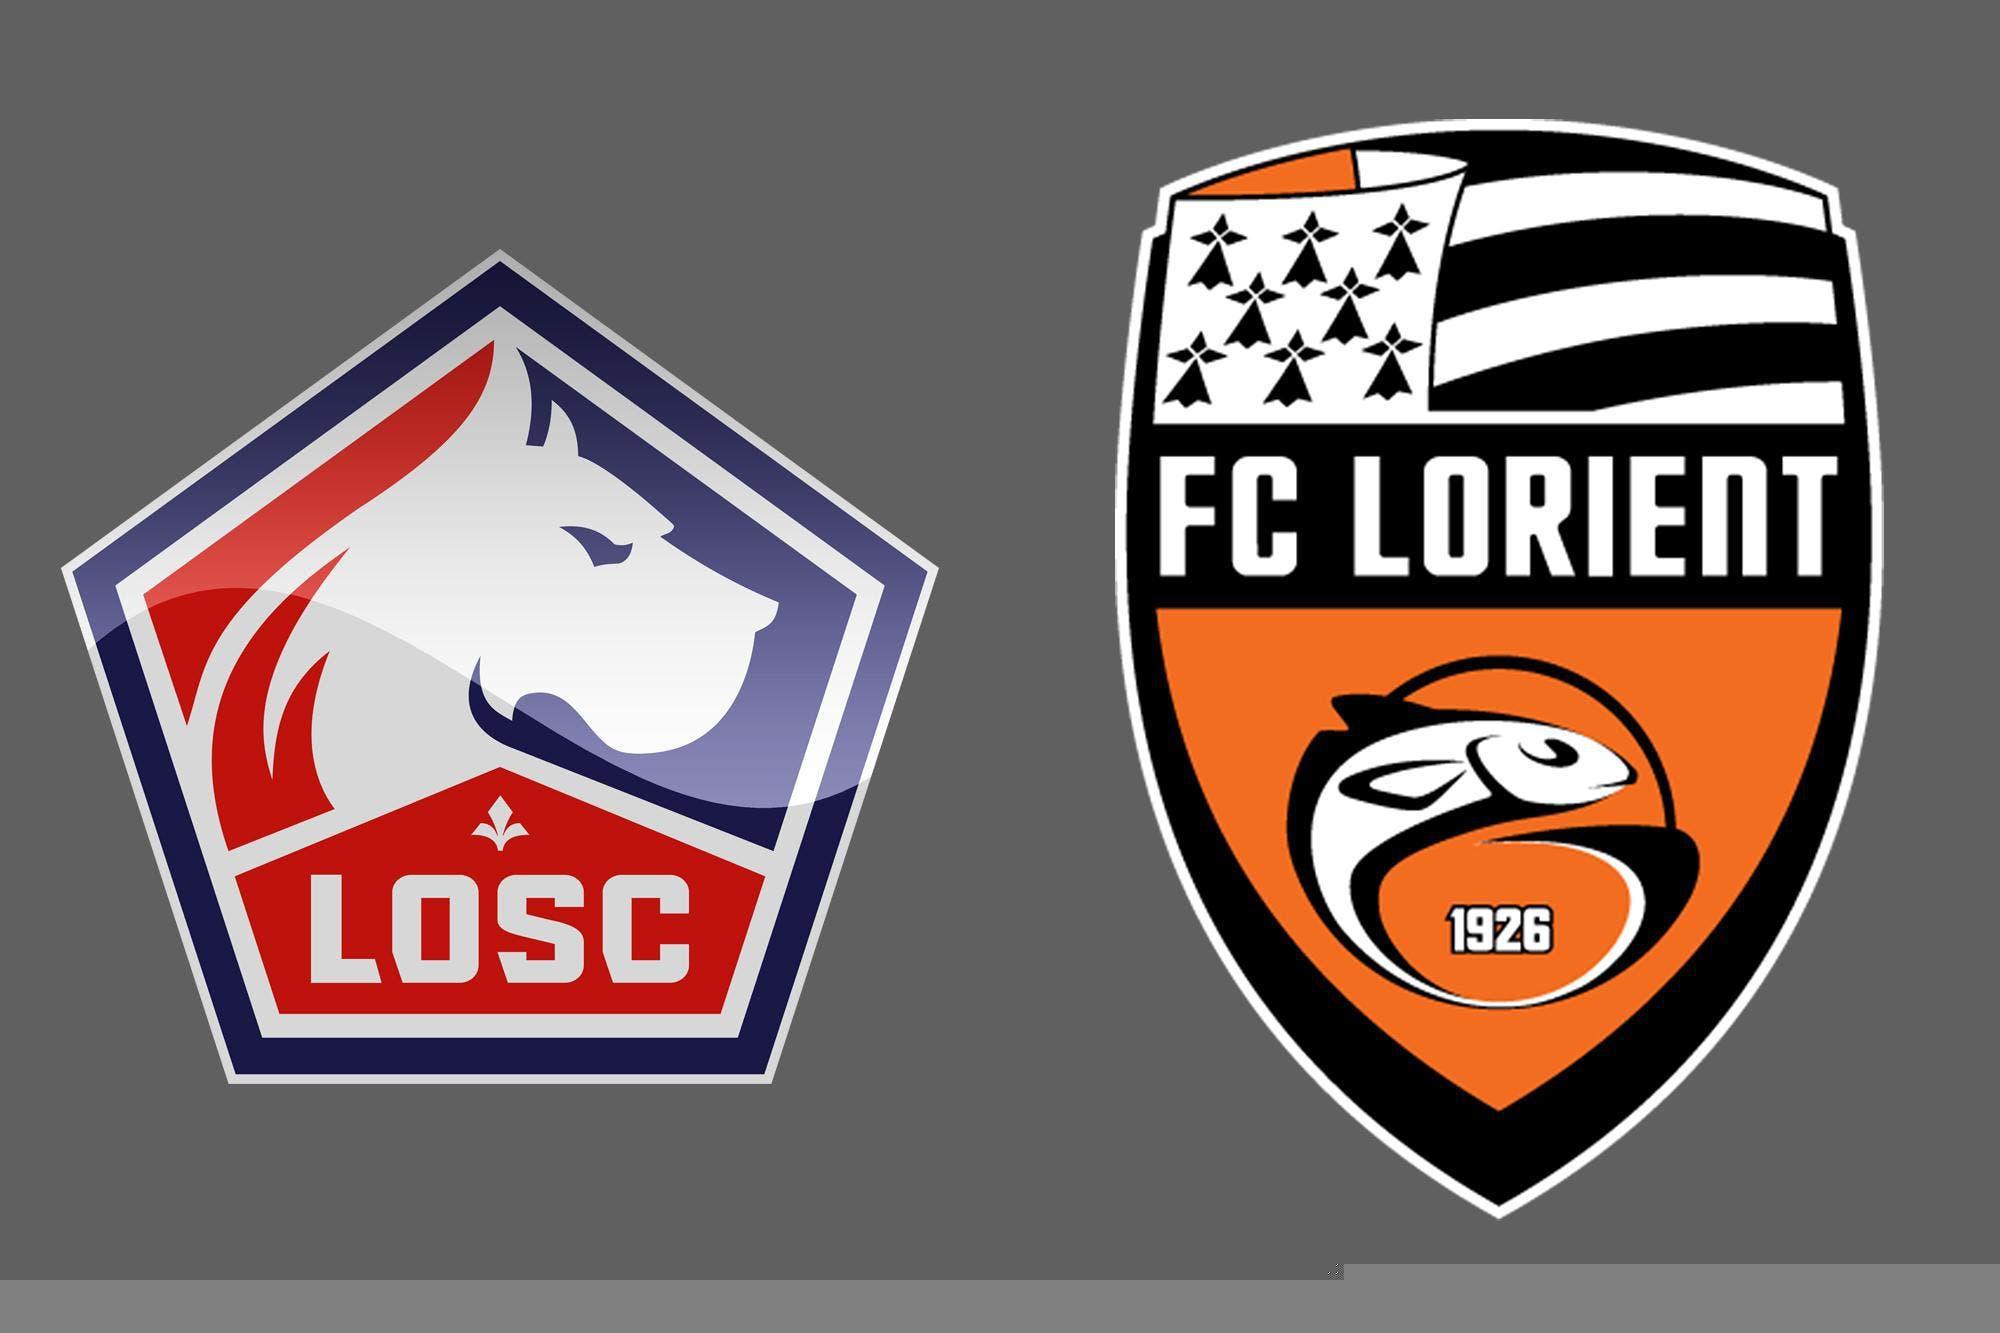 Ligue 1 de Francia: Lille venció por 4-0 a Lorient como local